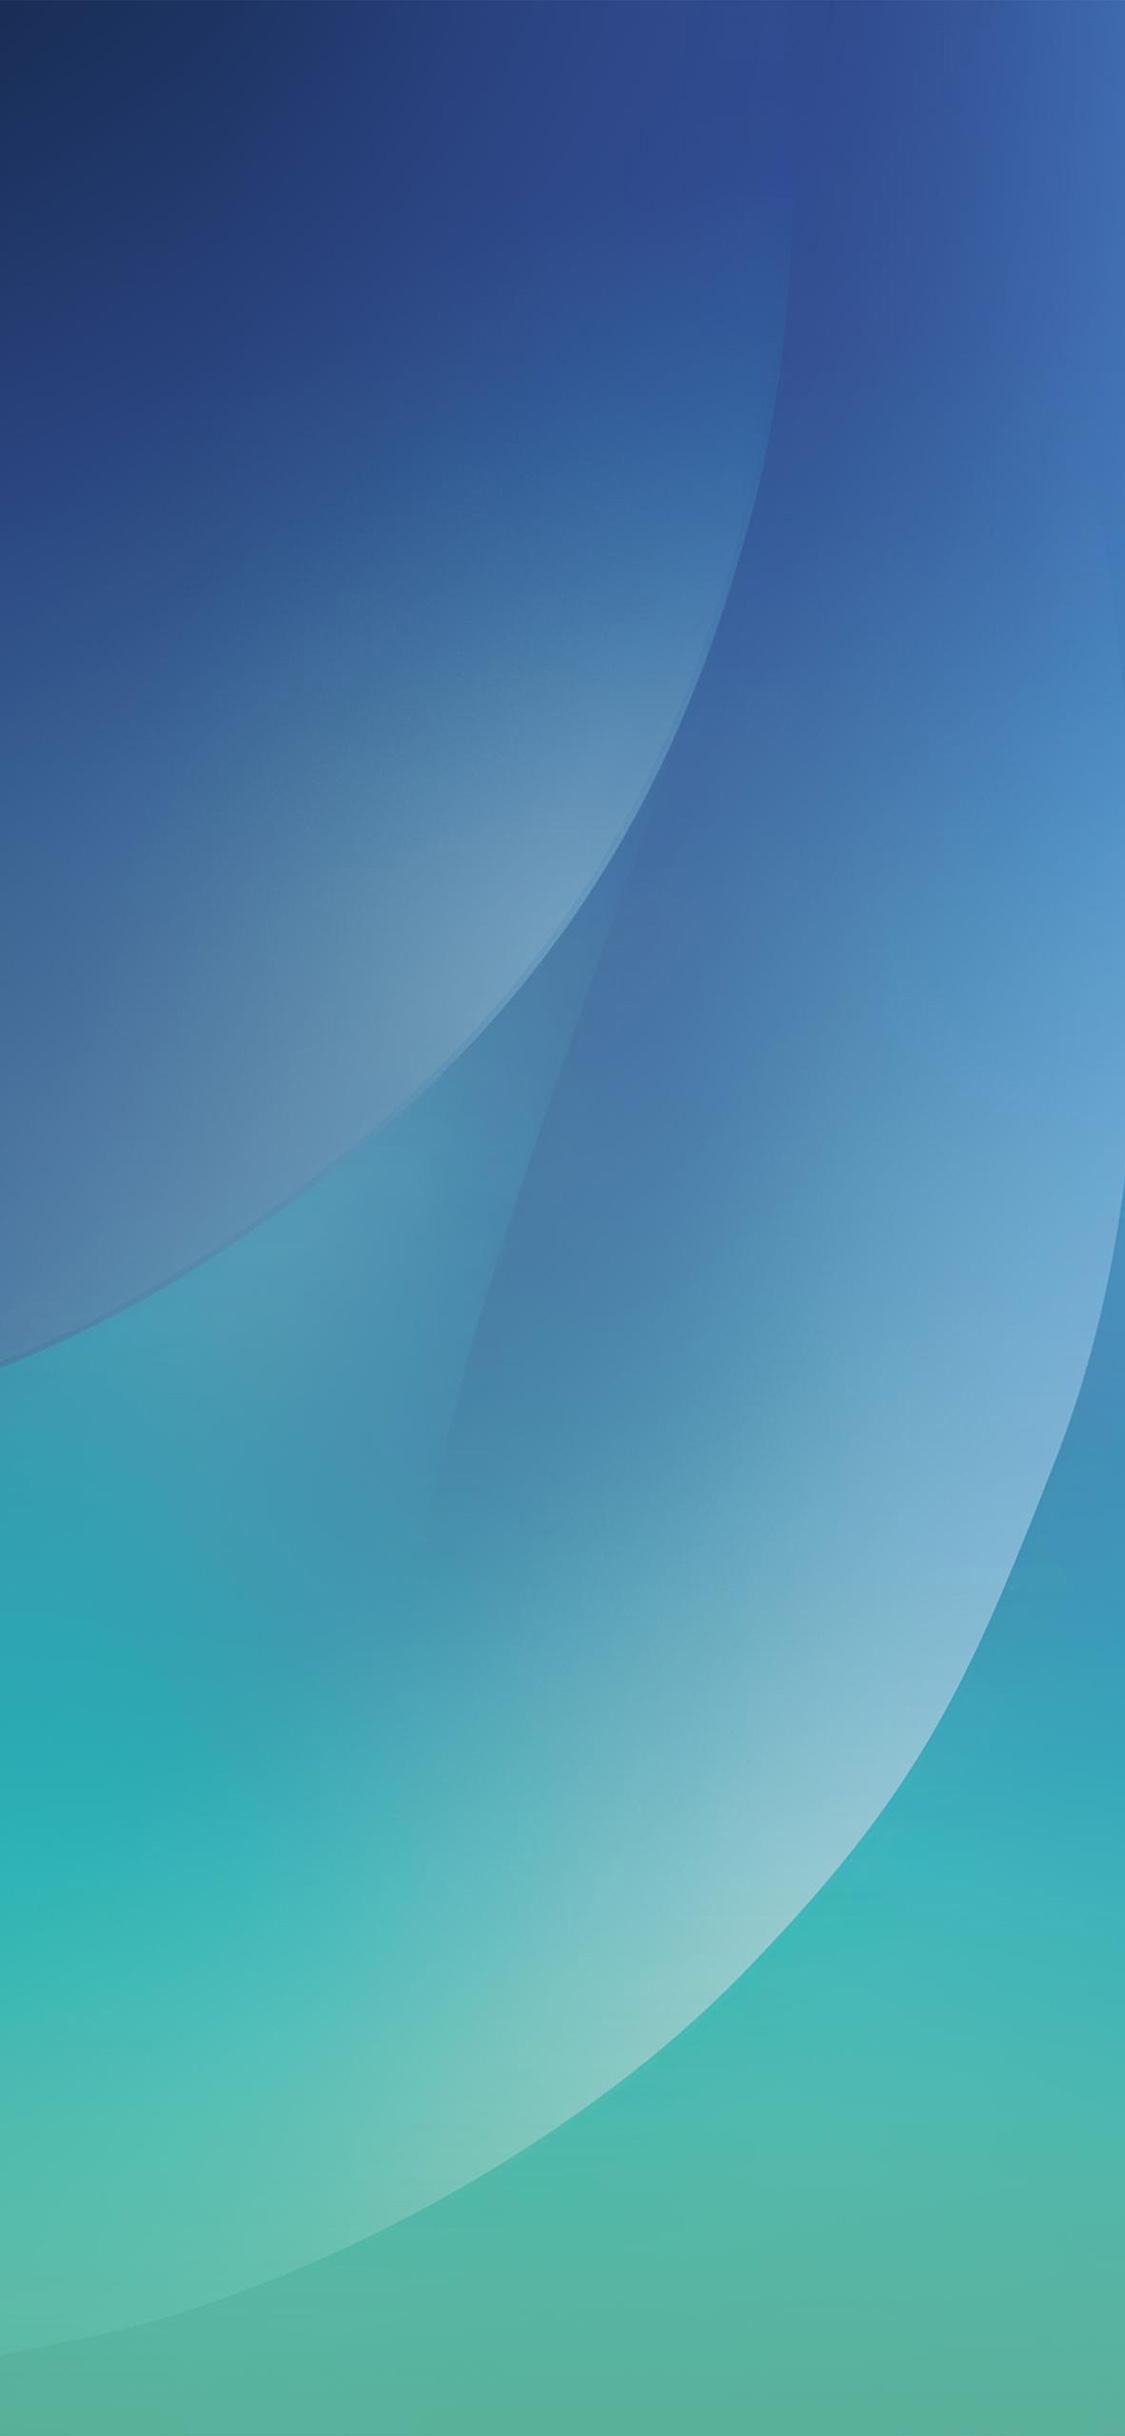 iPhoneXpapers.com-Apple-iPhone-wallpaper-vk79-blue-line-soft-digital-galaxy-pattern